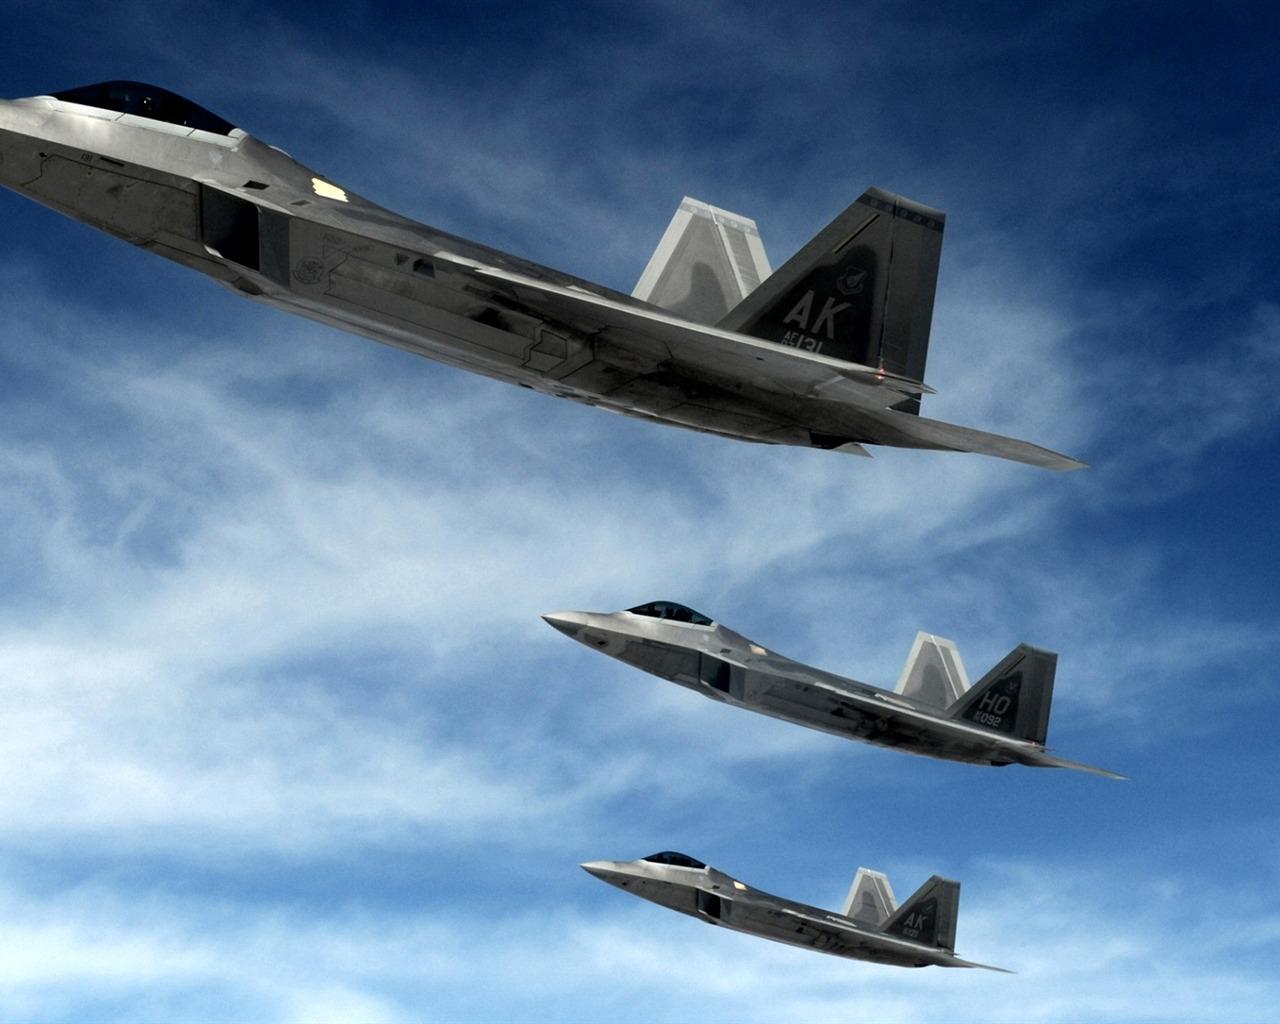 F 22 (戦闘機)の画像 p1_37